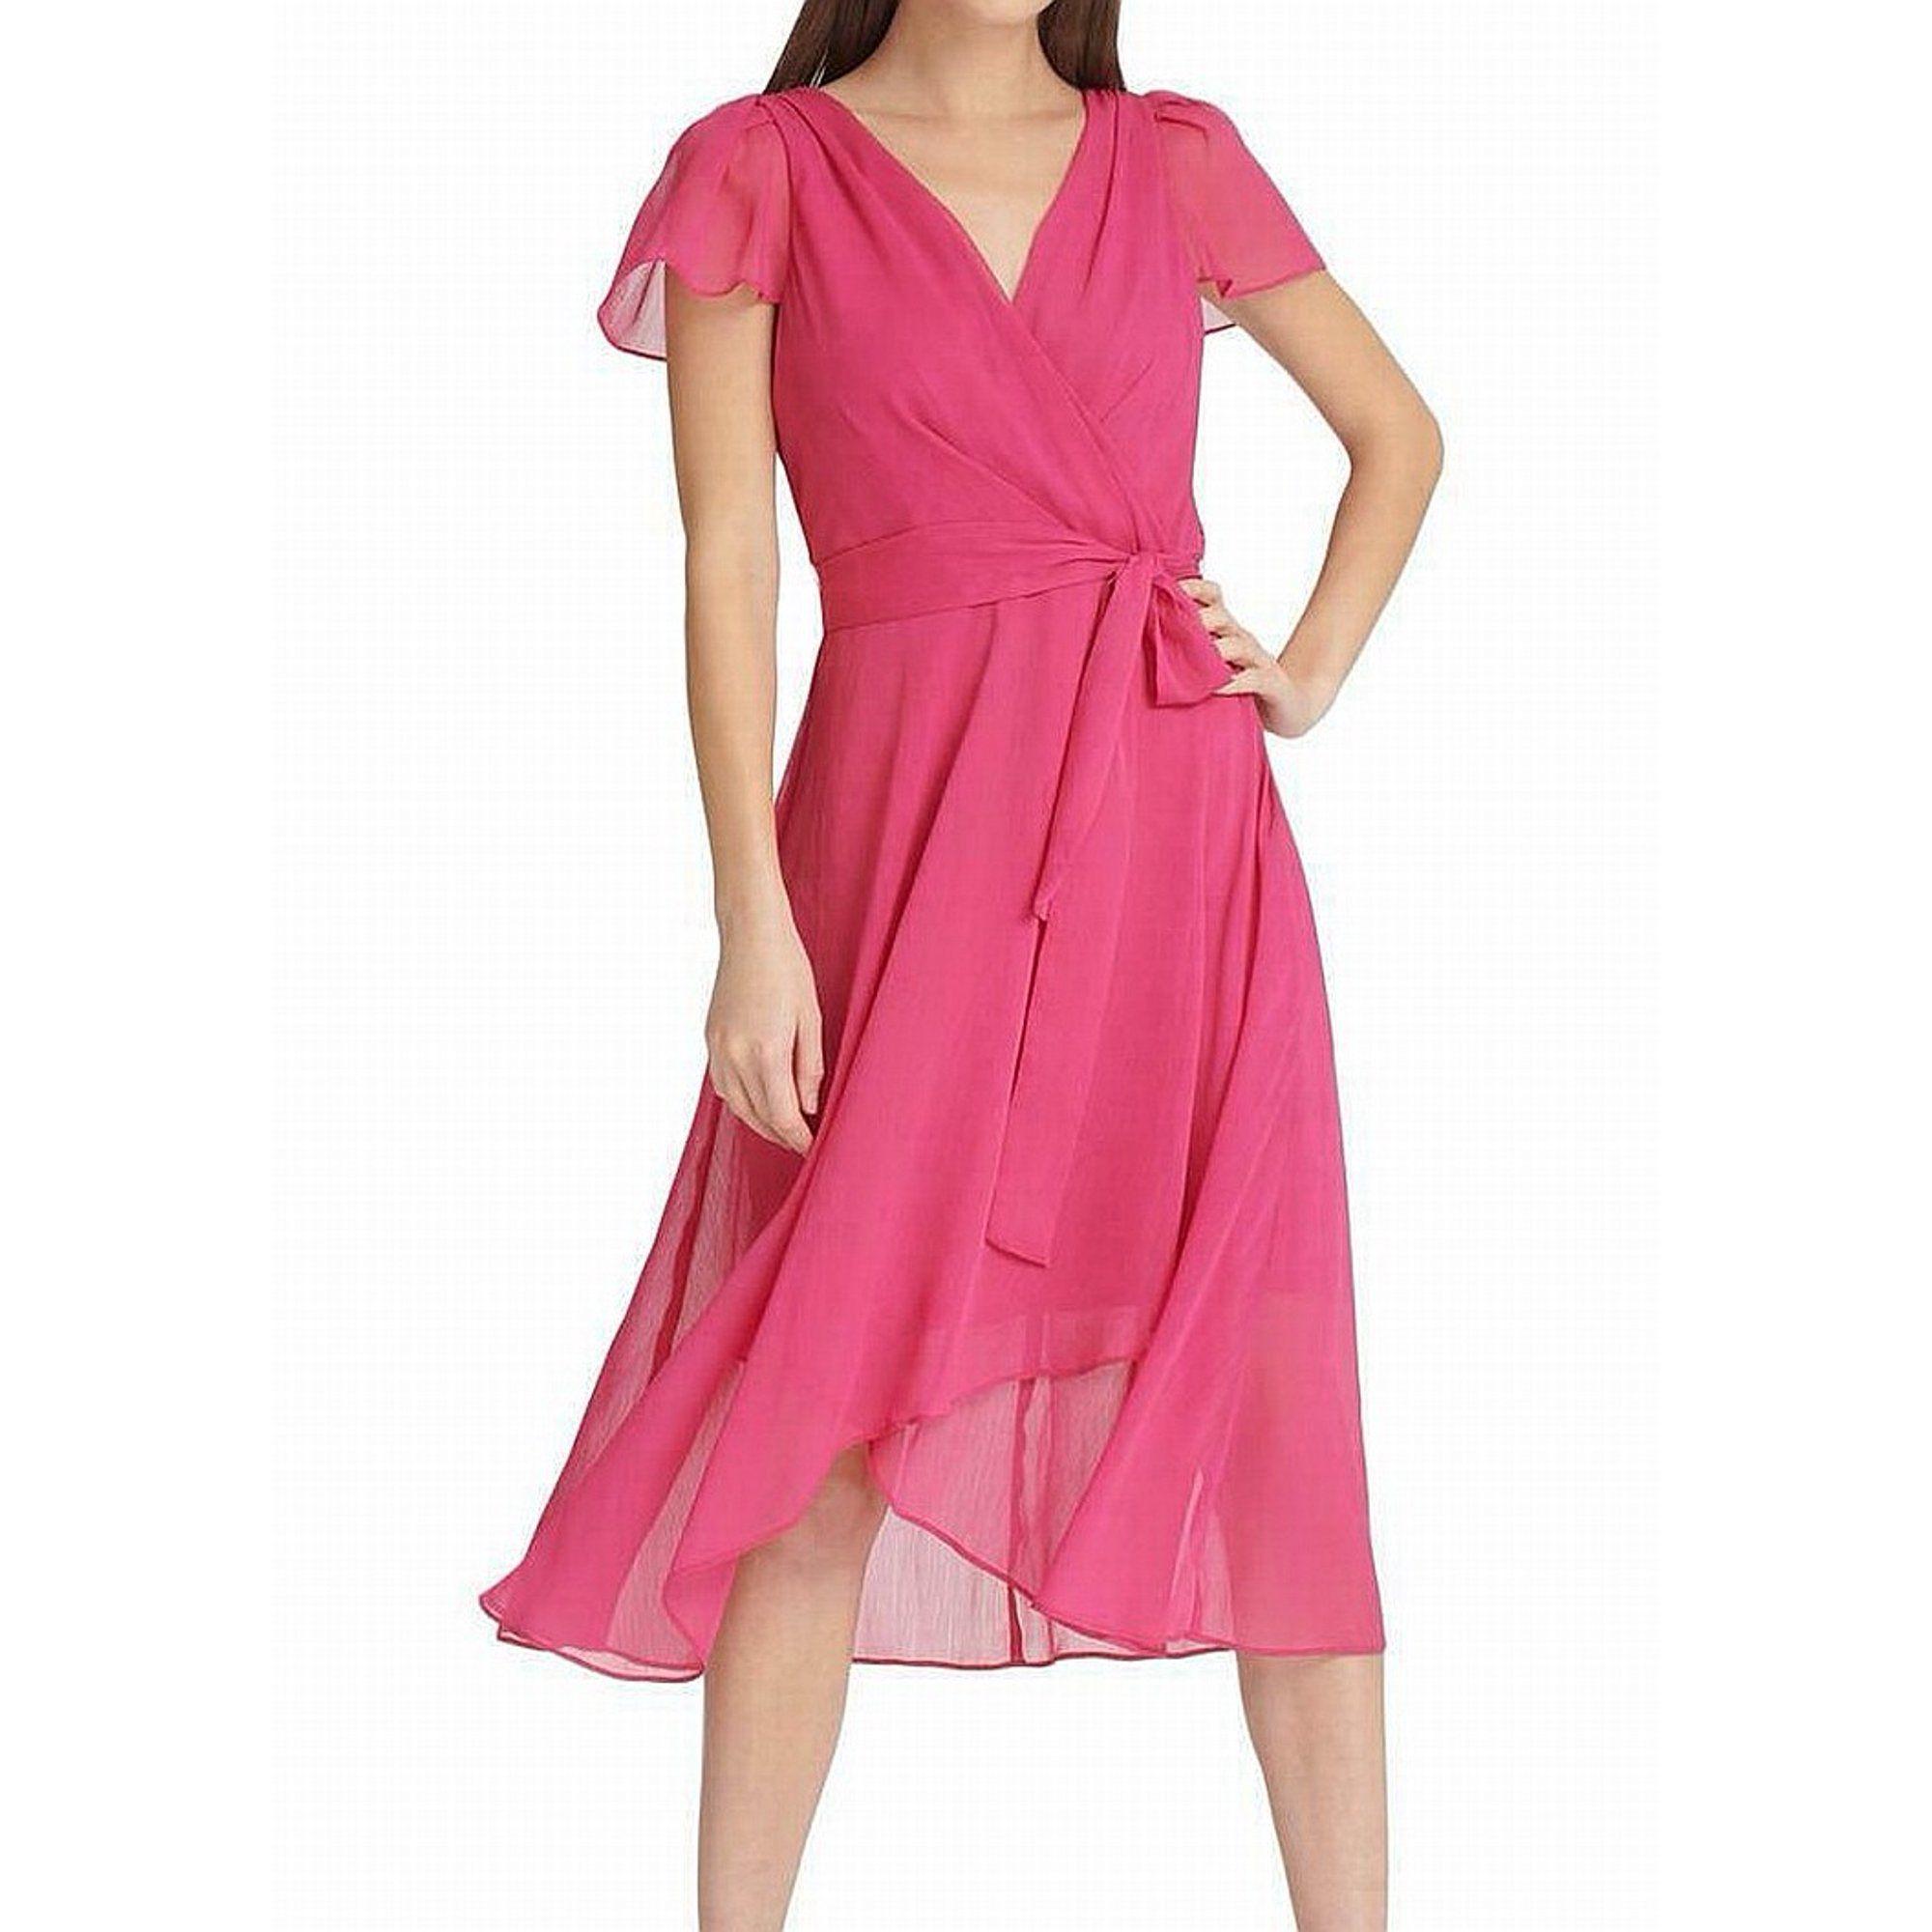 Dkny Dkny Womens Pink Short Sleeve V Neck Tea Length Sheath Cocktail Dress Size 4 Walmart Com Fuschia Dress Womens Dresses Dresses [ 2000 x 2000 Pixel ]